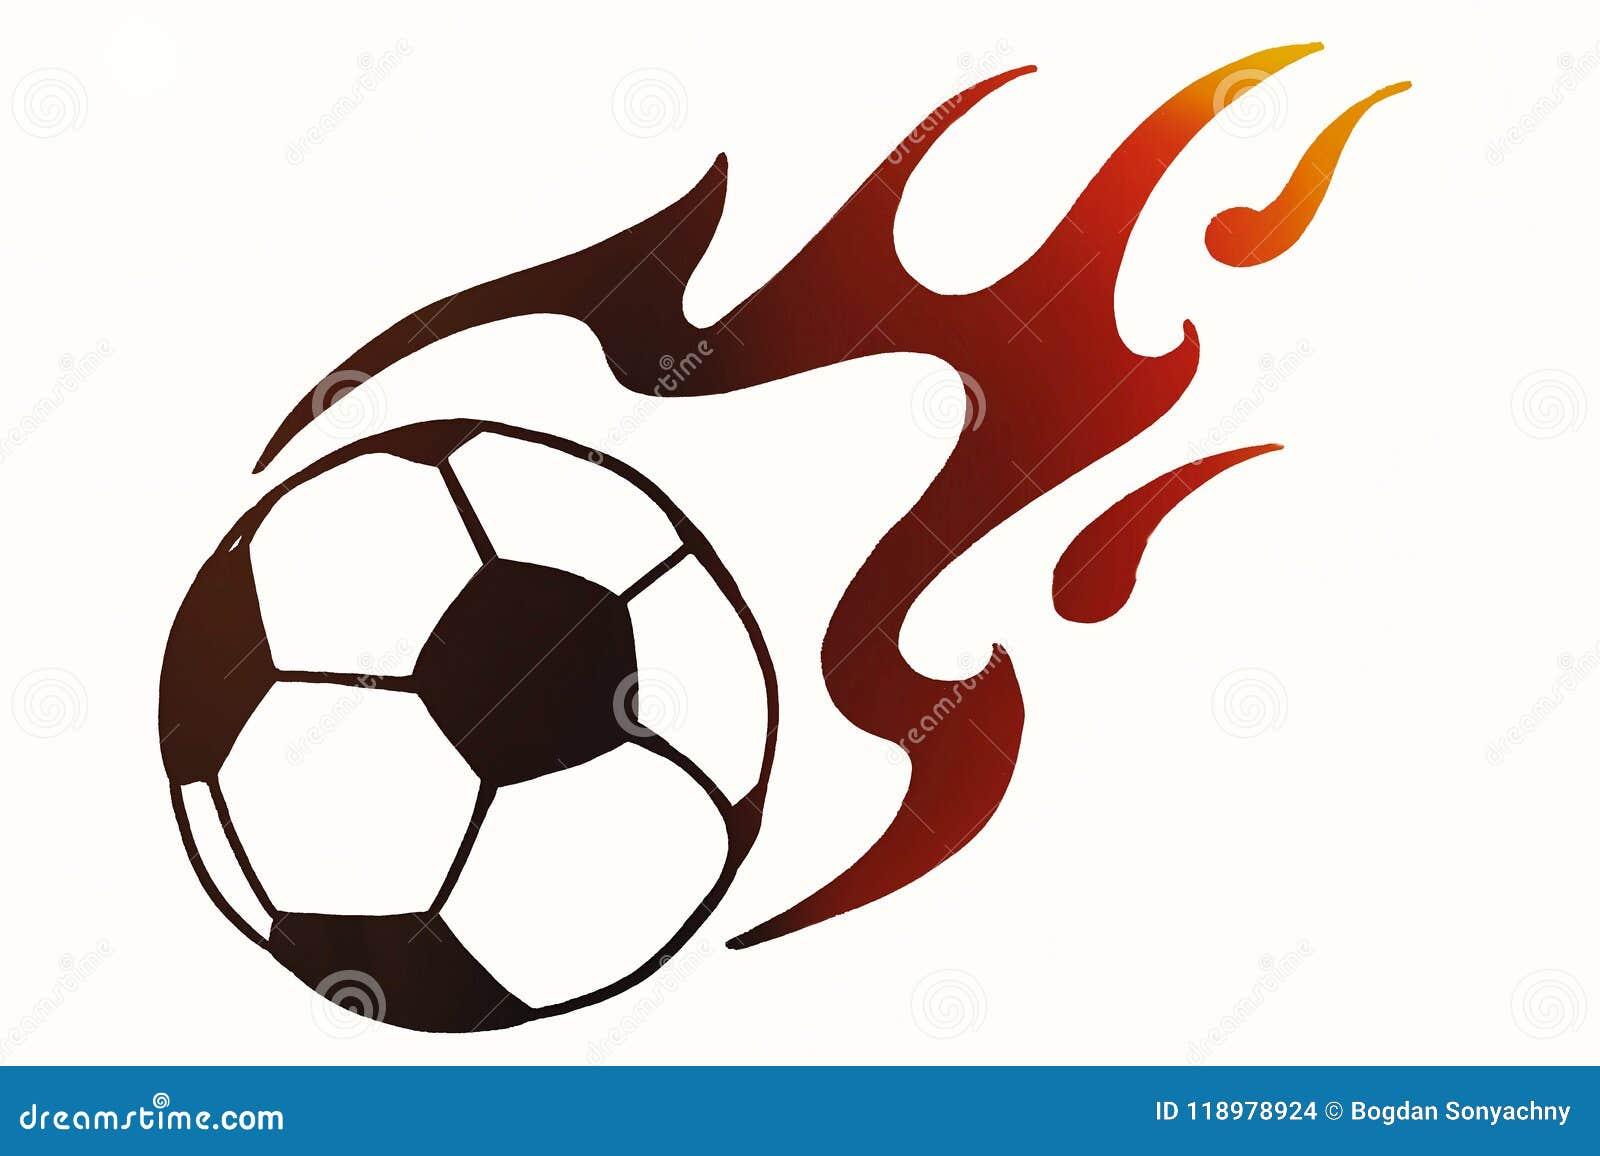 Ballon De Football En Feu Illustration Simple Tirée Par La Main